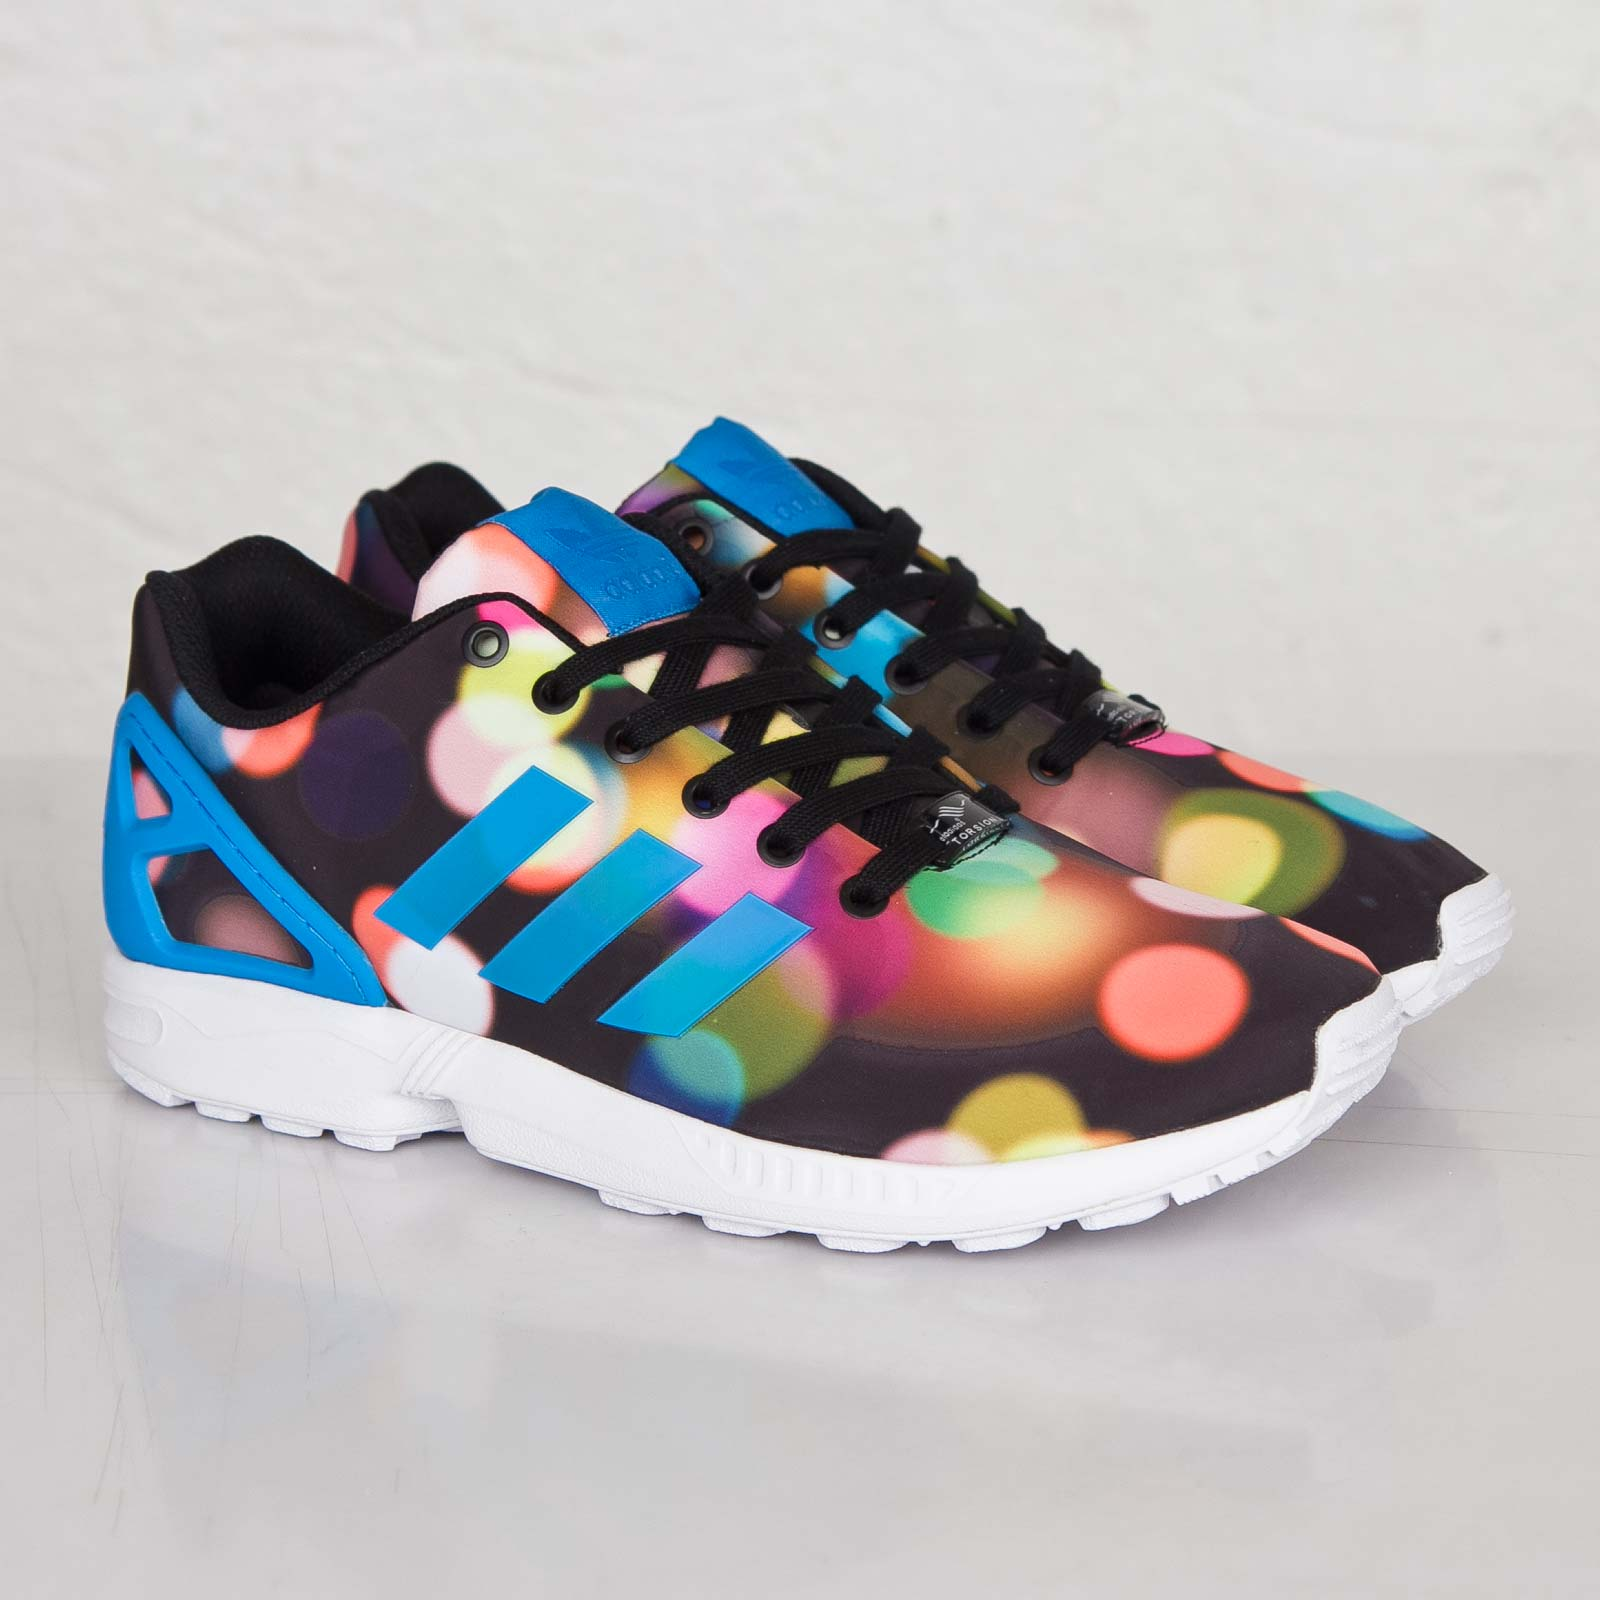 premium selection 50e78 1724e adidas ZX Flux - B23984 - Sneakersnstuff   sneakers ...